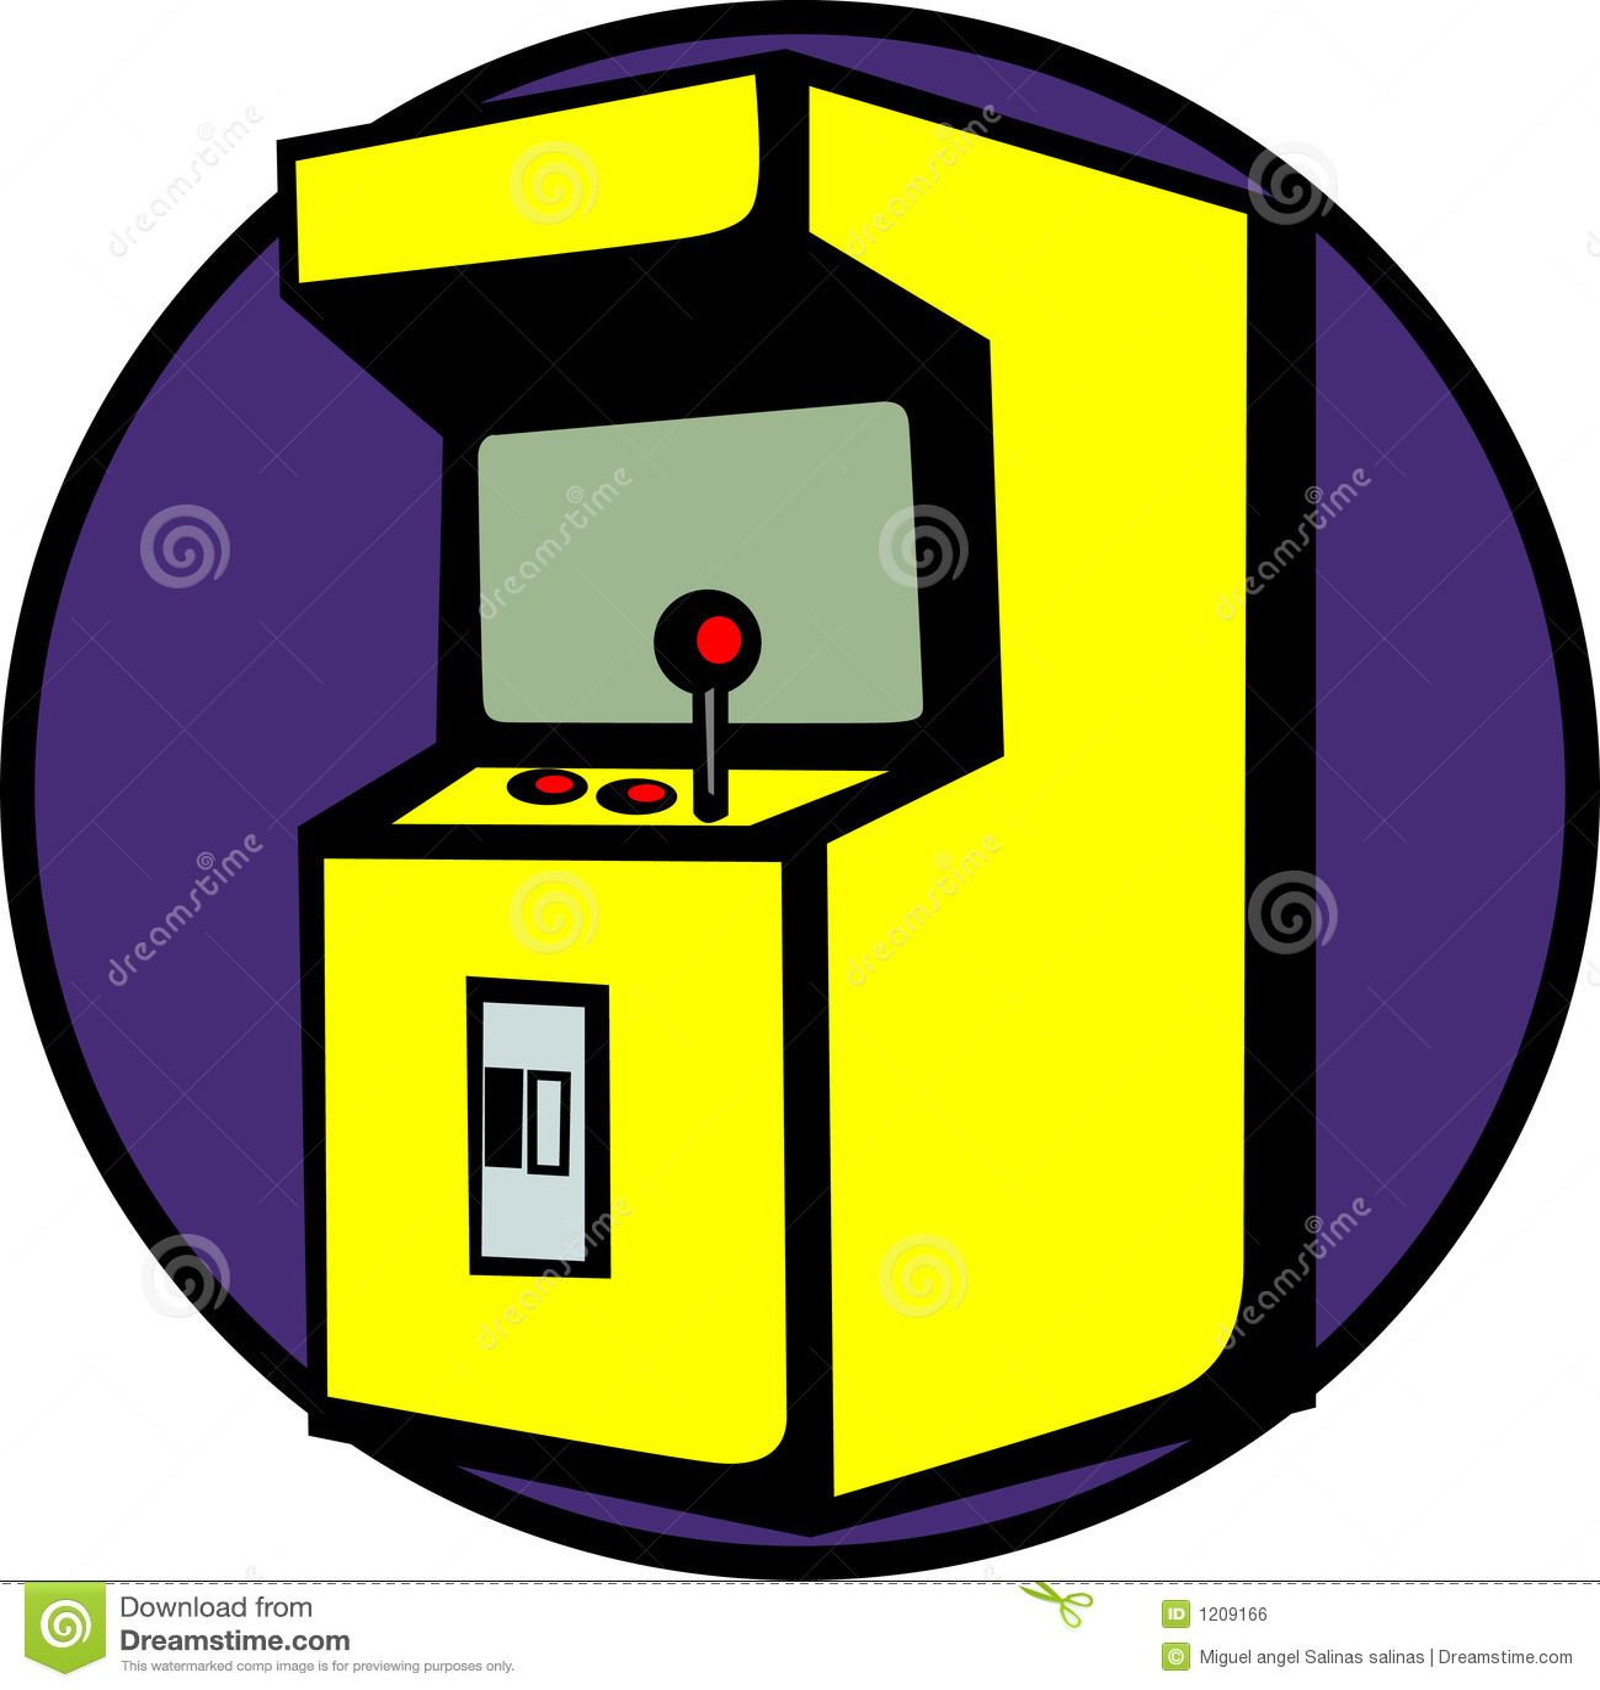 Videogame Arcade Machine Vector Illustration Stock Vector